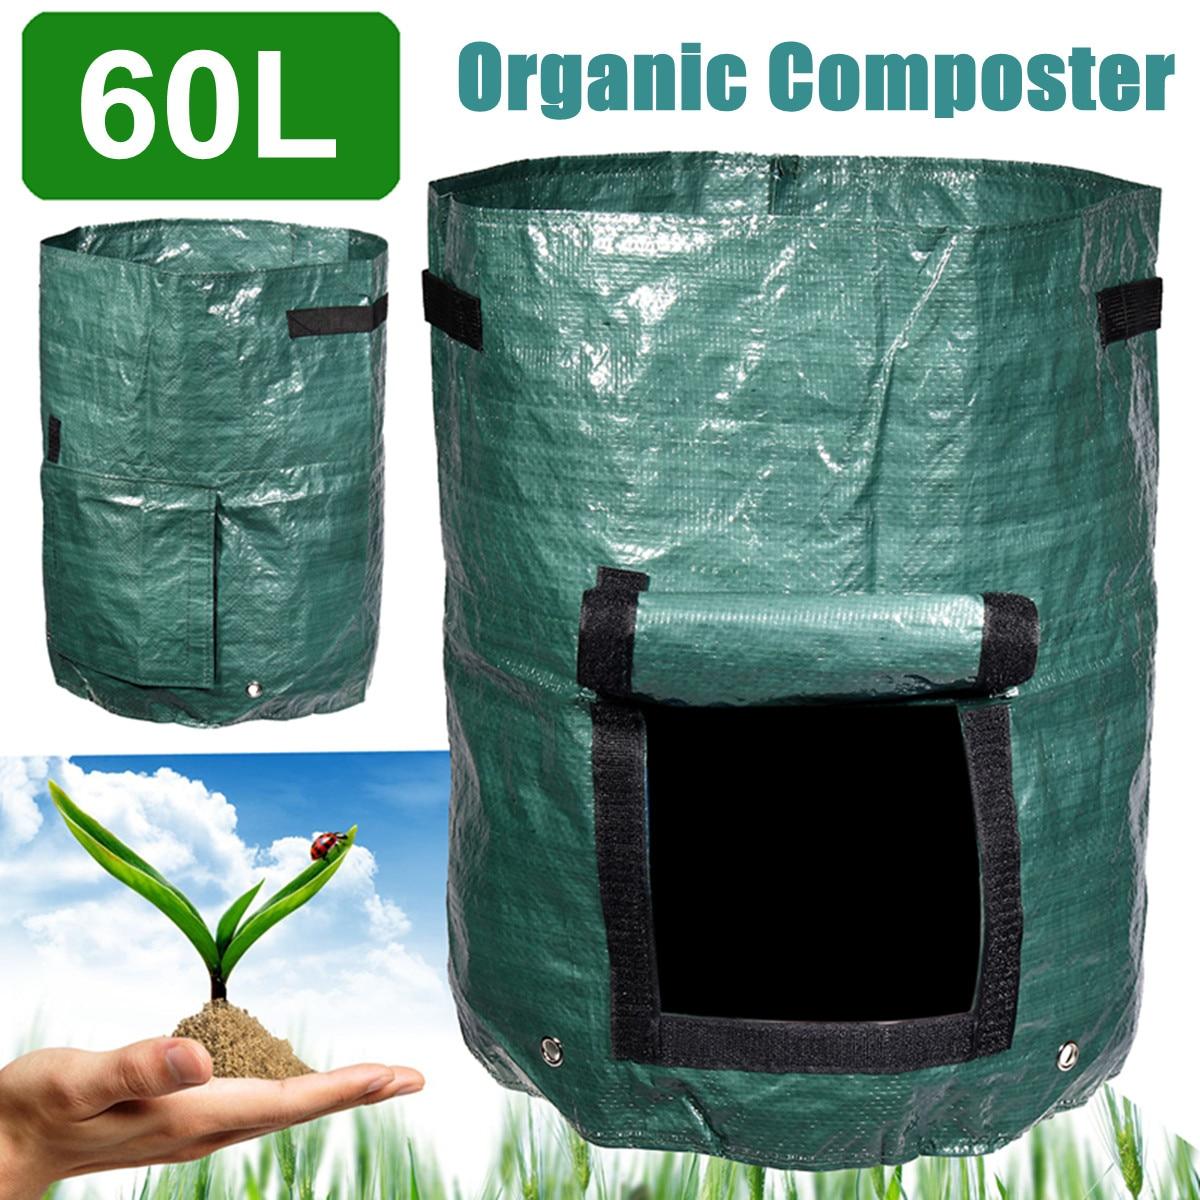 Garden Composter Bin Grow Bag 60L Eco Friendly Organic Compost Storage Bag Green Waste Converter Tools Yard Garden Supplies